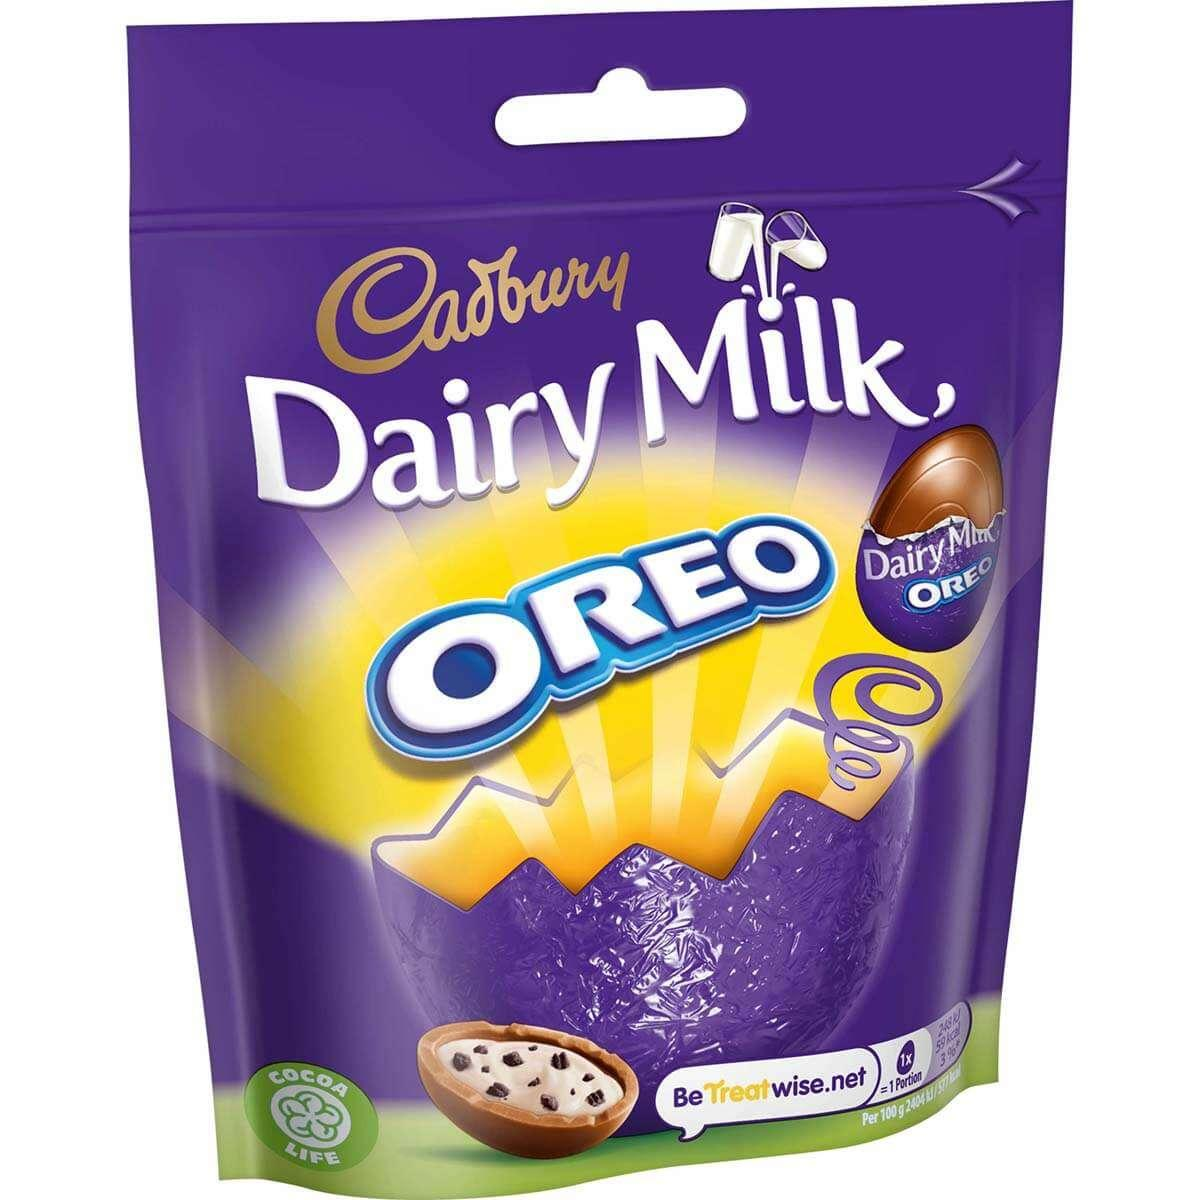 Cadbury Dairy Milk Miniature Oreo Chocolate Egg Bag 72 g